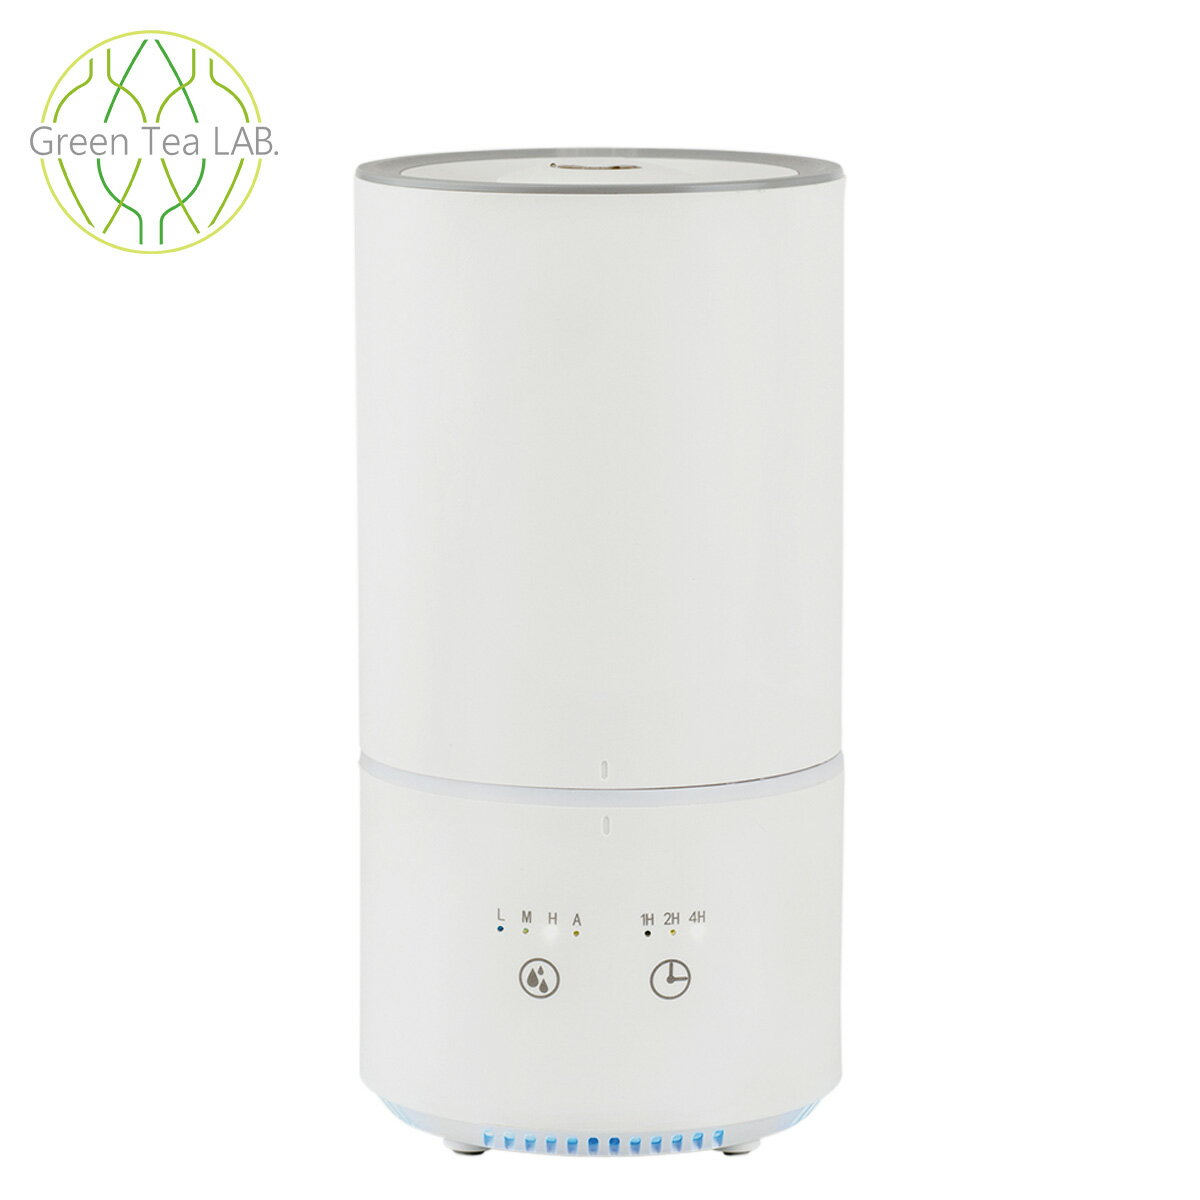 季節・空調家電, 加湿器 1000OFF Green Tea LAB. 1L KNA88078